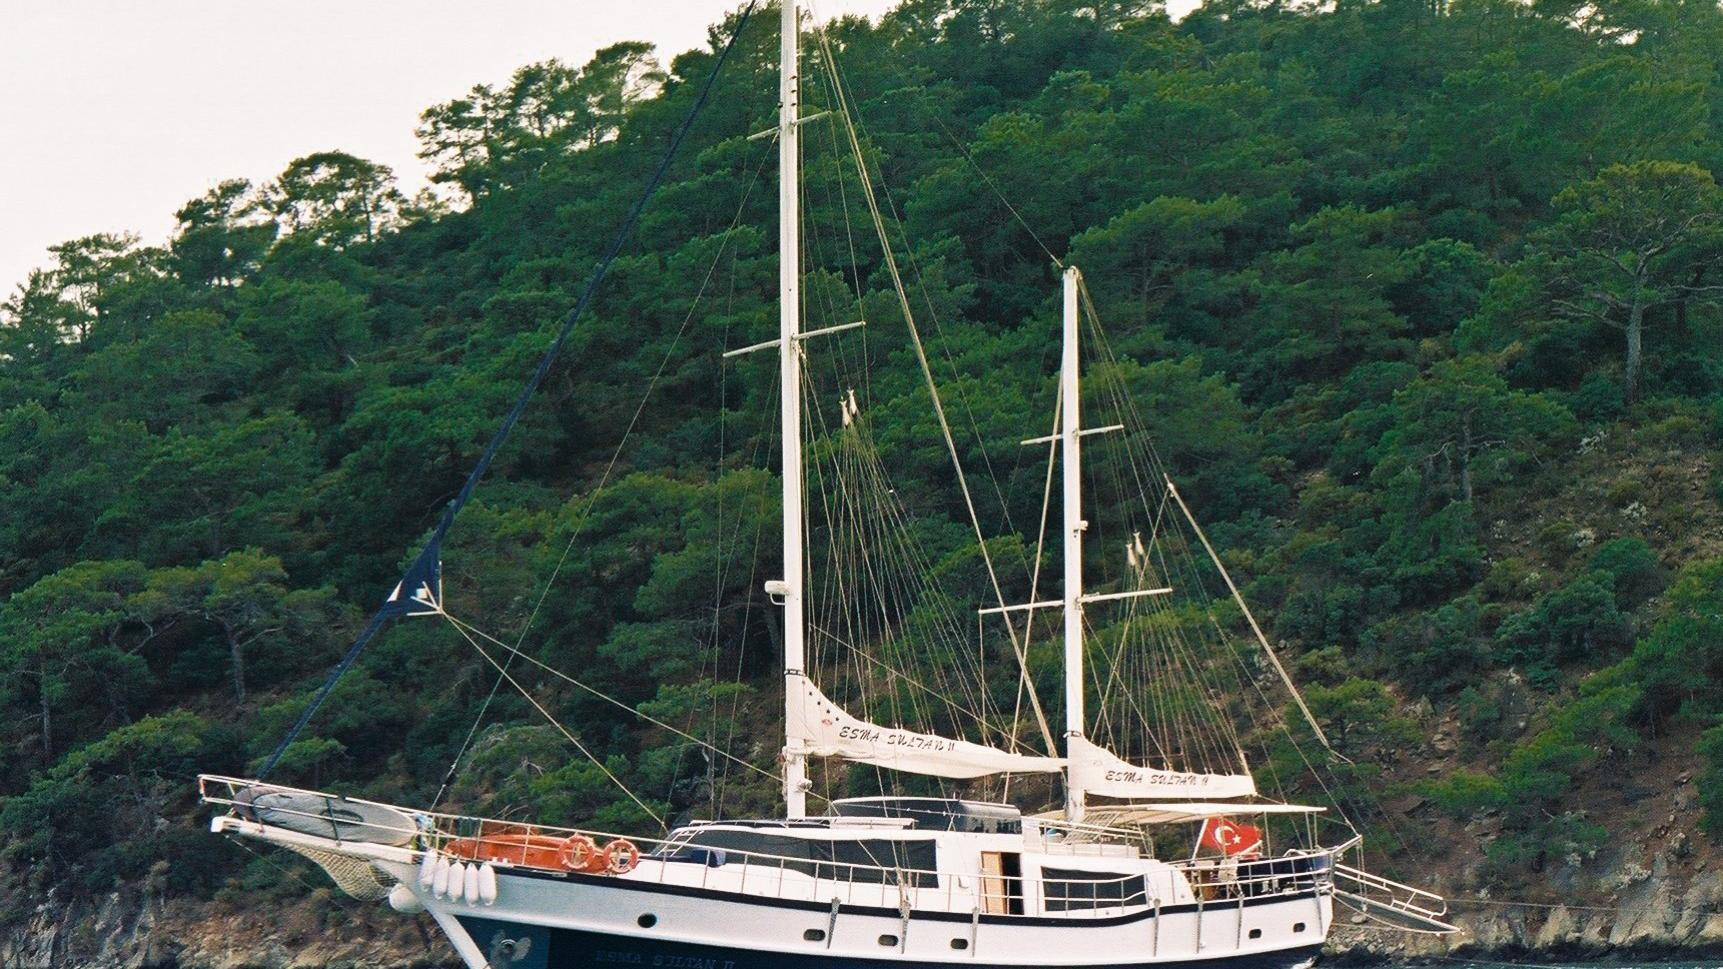 esma-sultan-ii-yacht-for-charter-profile